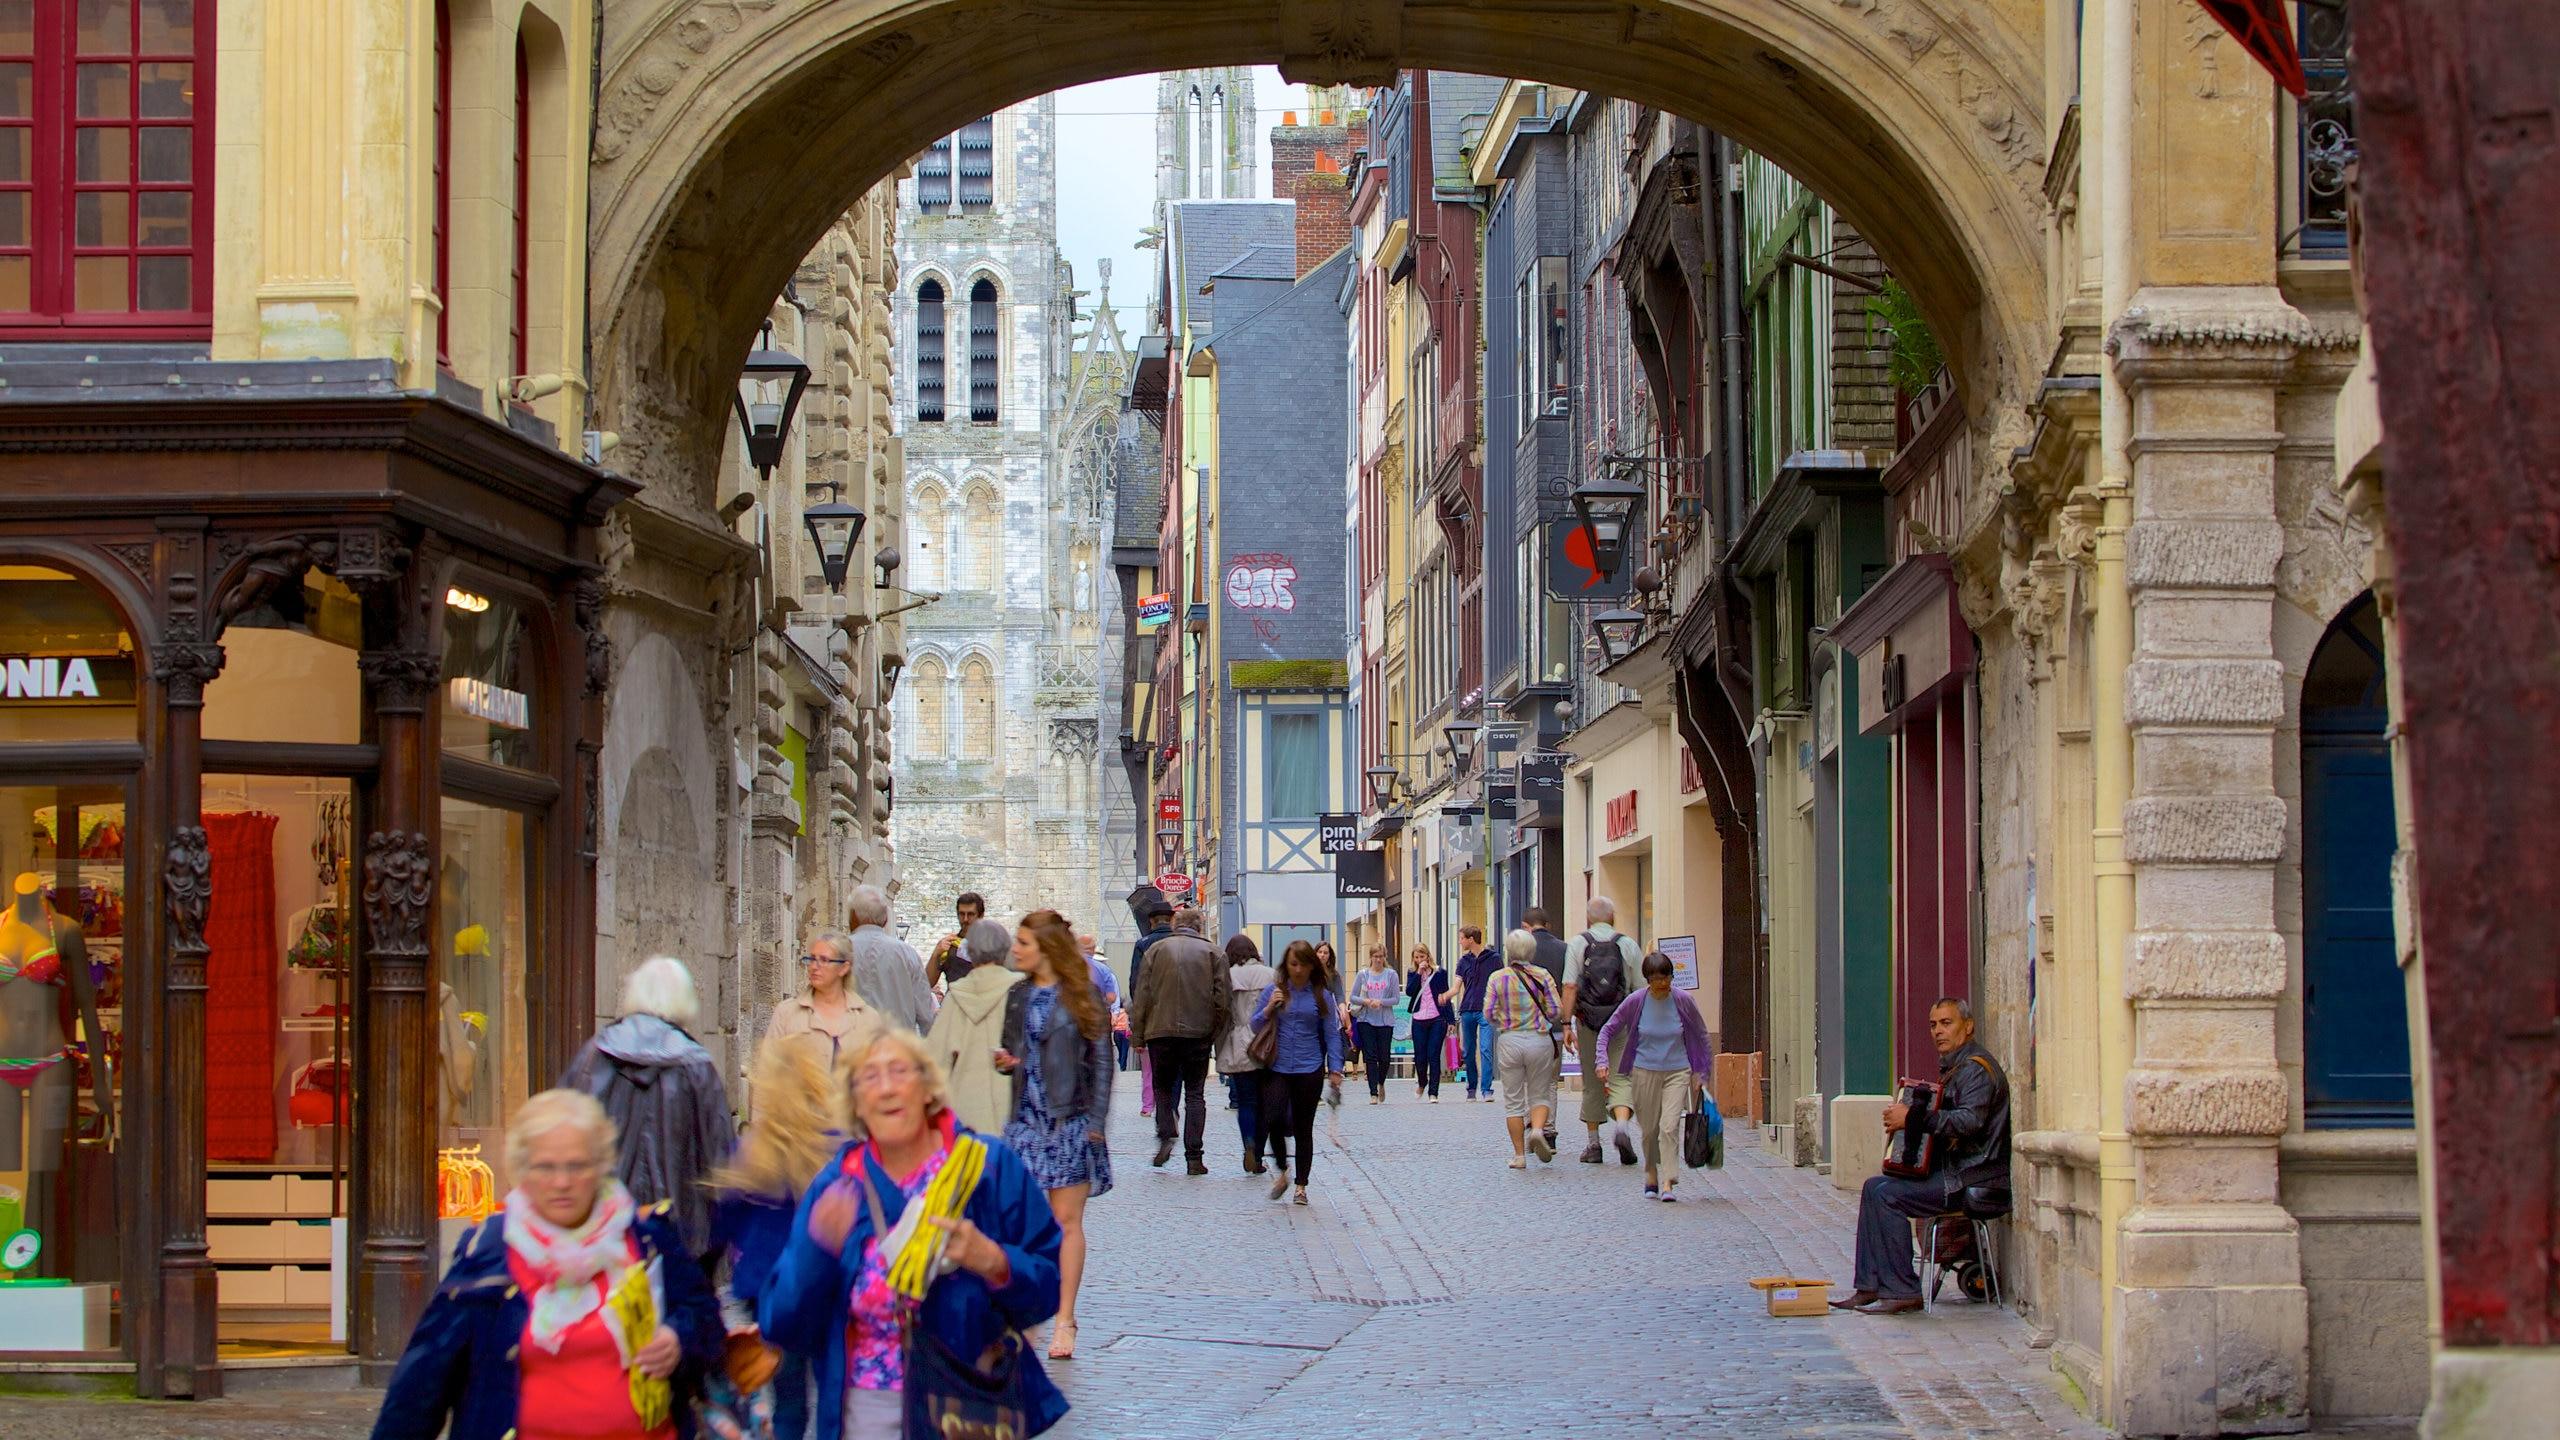 Rouen, Seine-Maritime, France